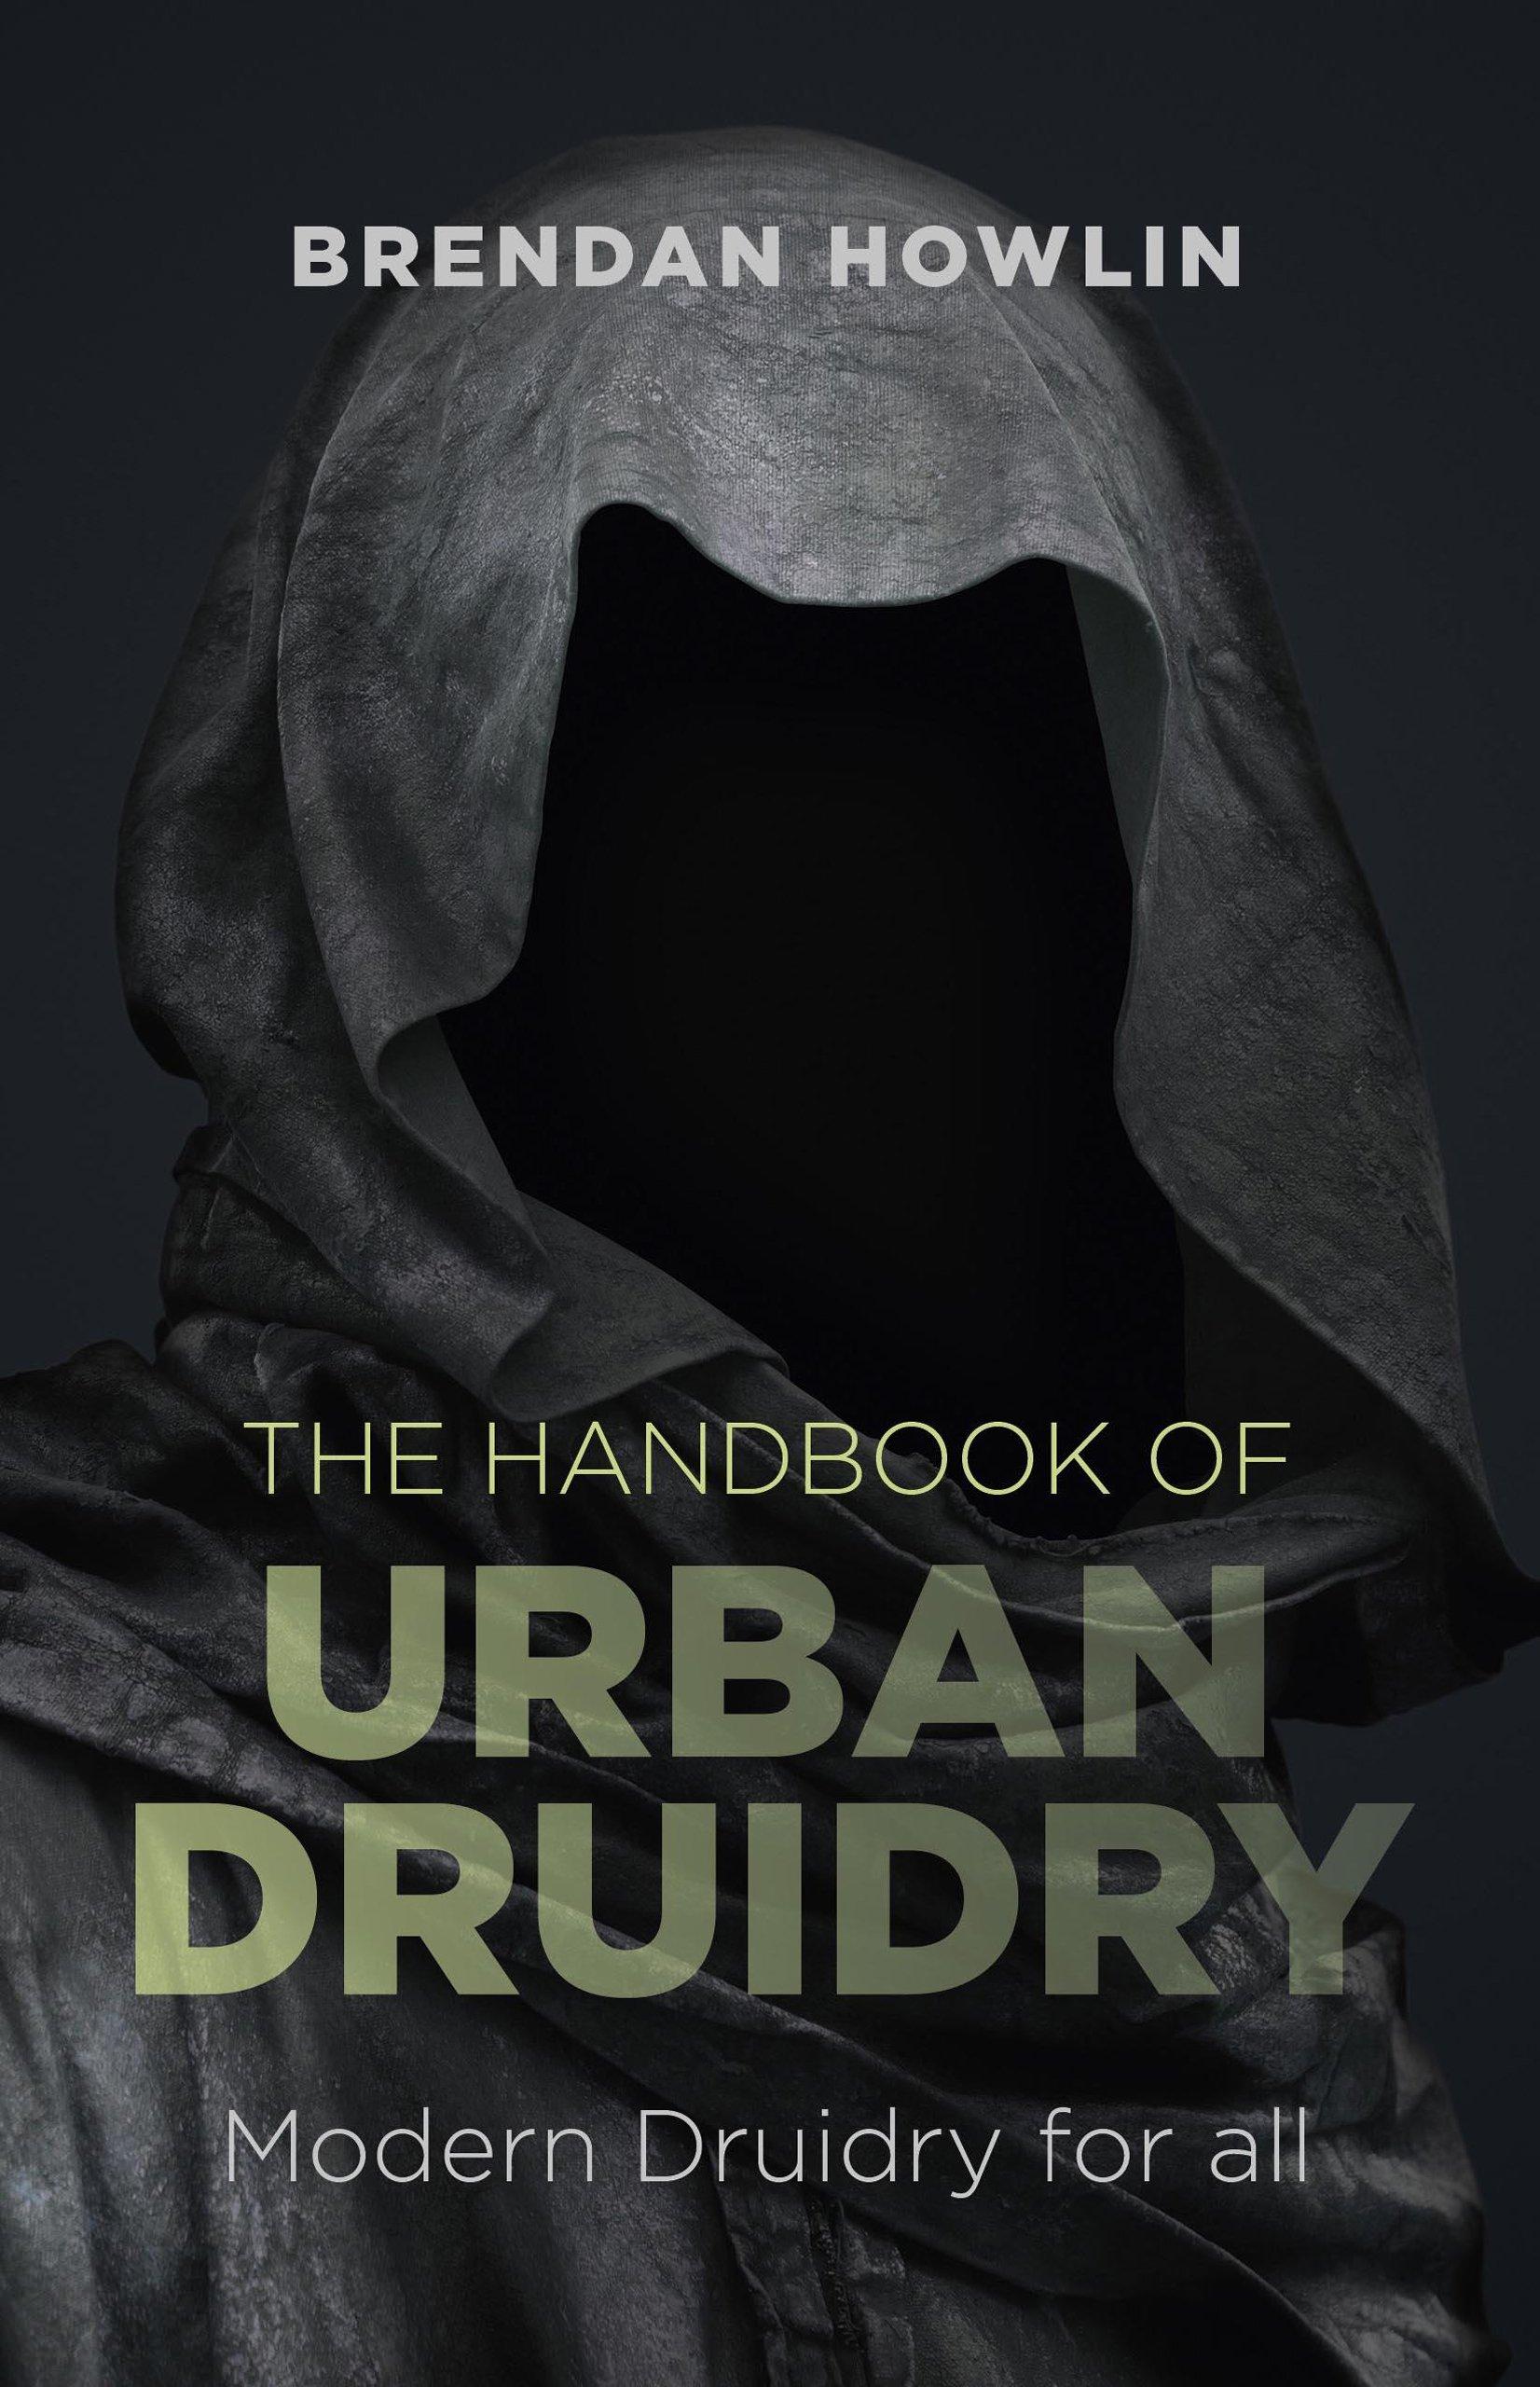 The Handbook of Urban Druidry: Modern Druidry for All ebook